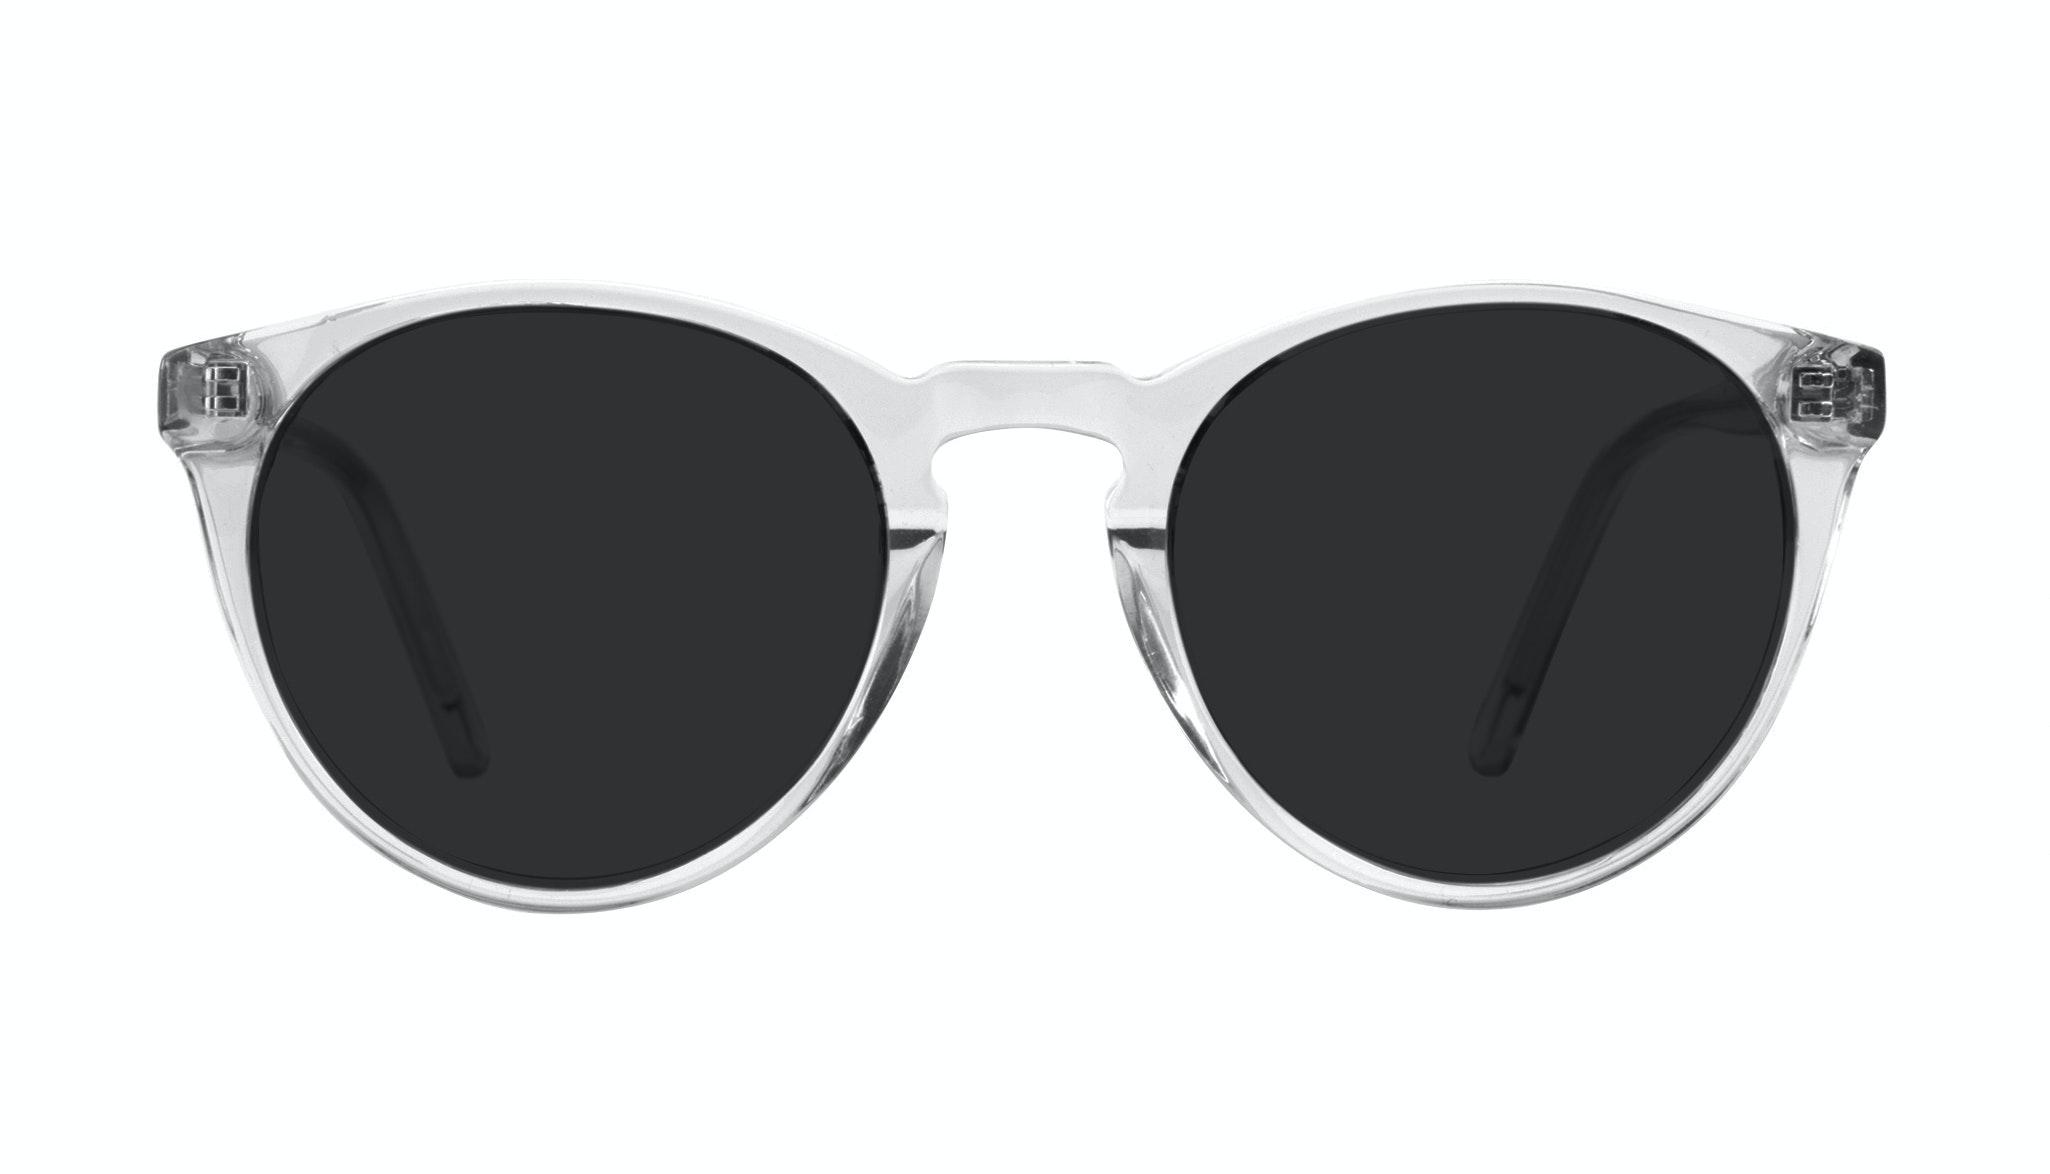 Affordable Fashion Glasses Round Sunglasses Men Arch Grey